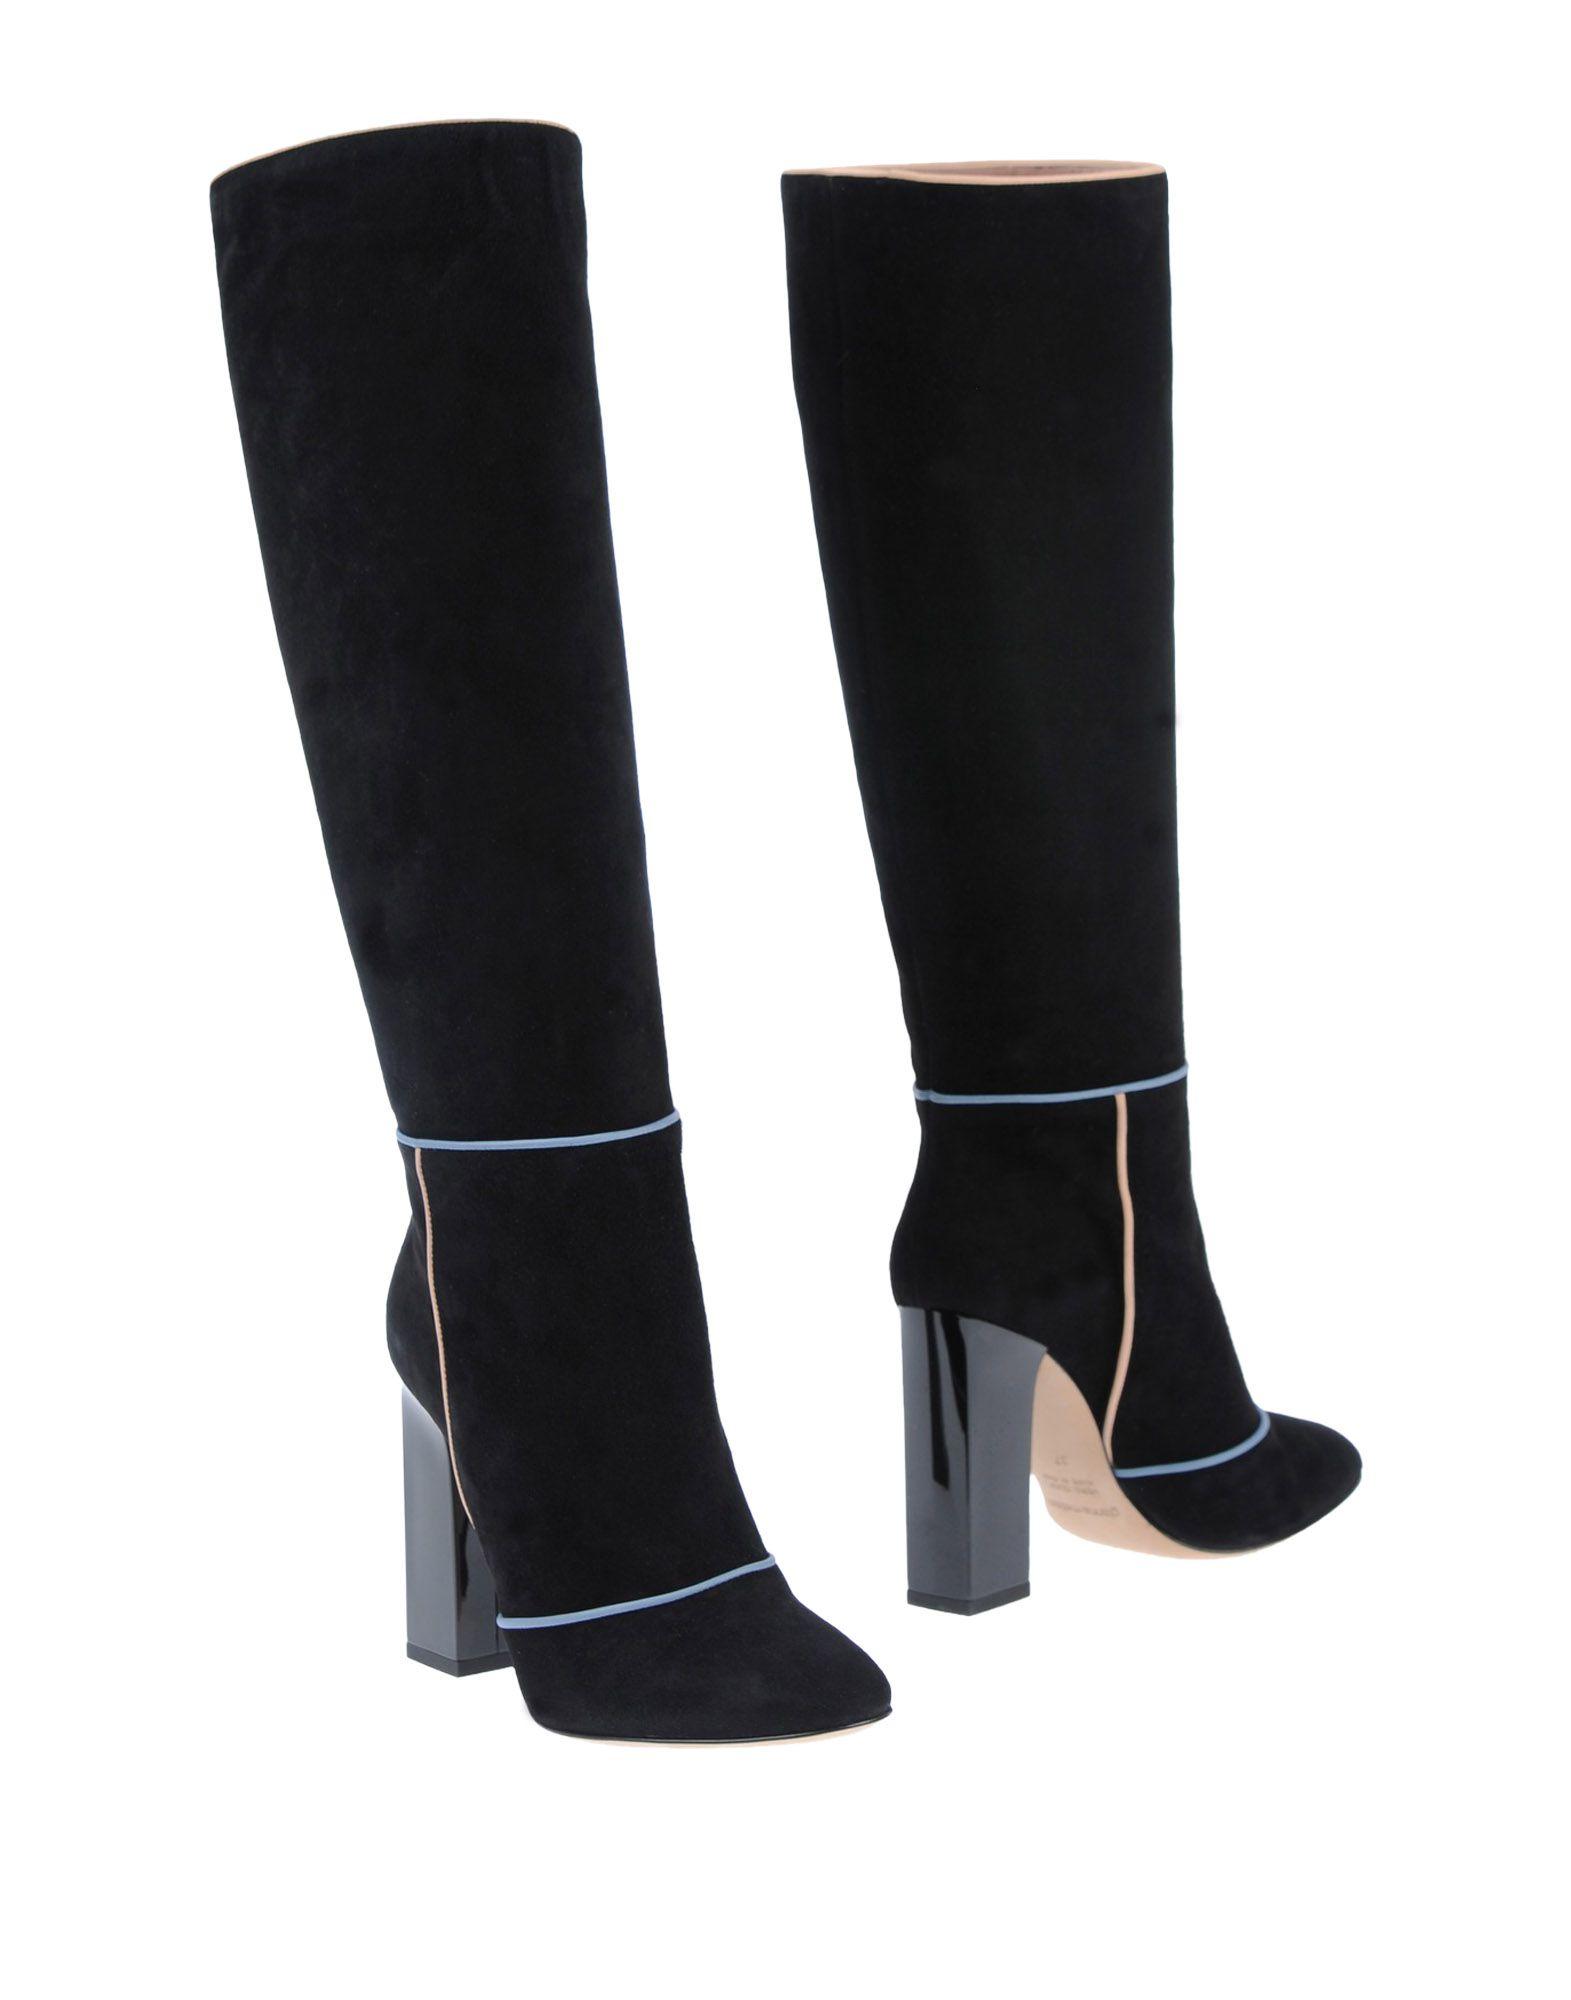 Gianna Meliani Beliebte Stiefel Damen  11507271HK Beliebte Meliani Schuhe 189a38